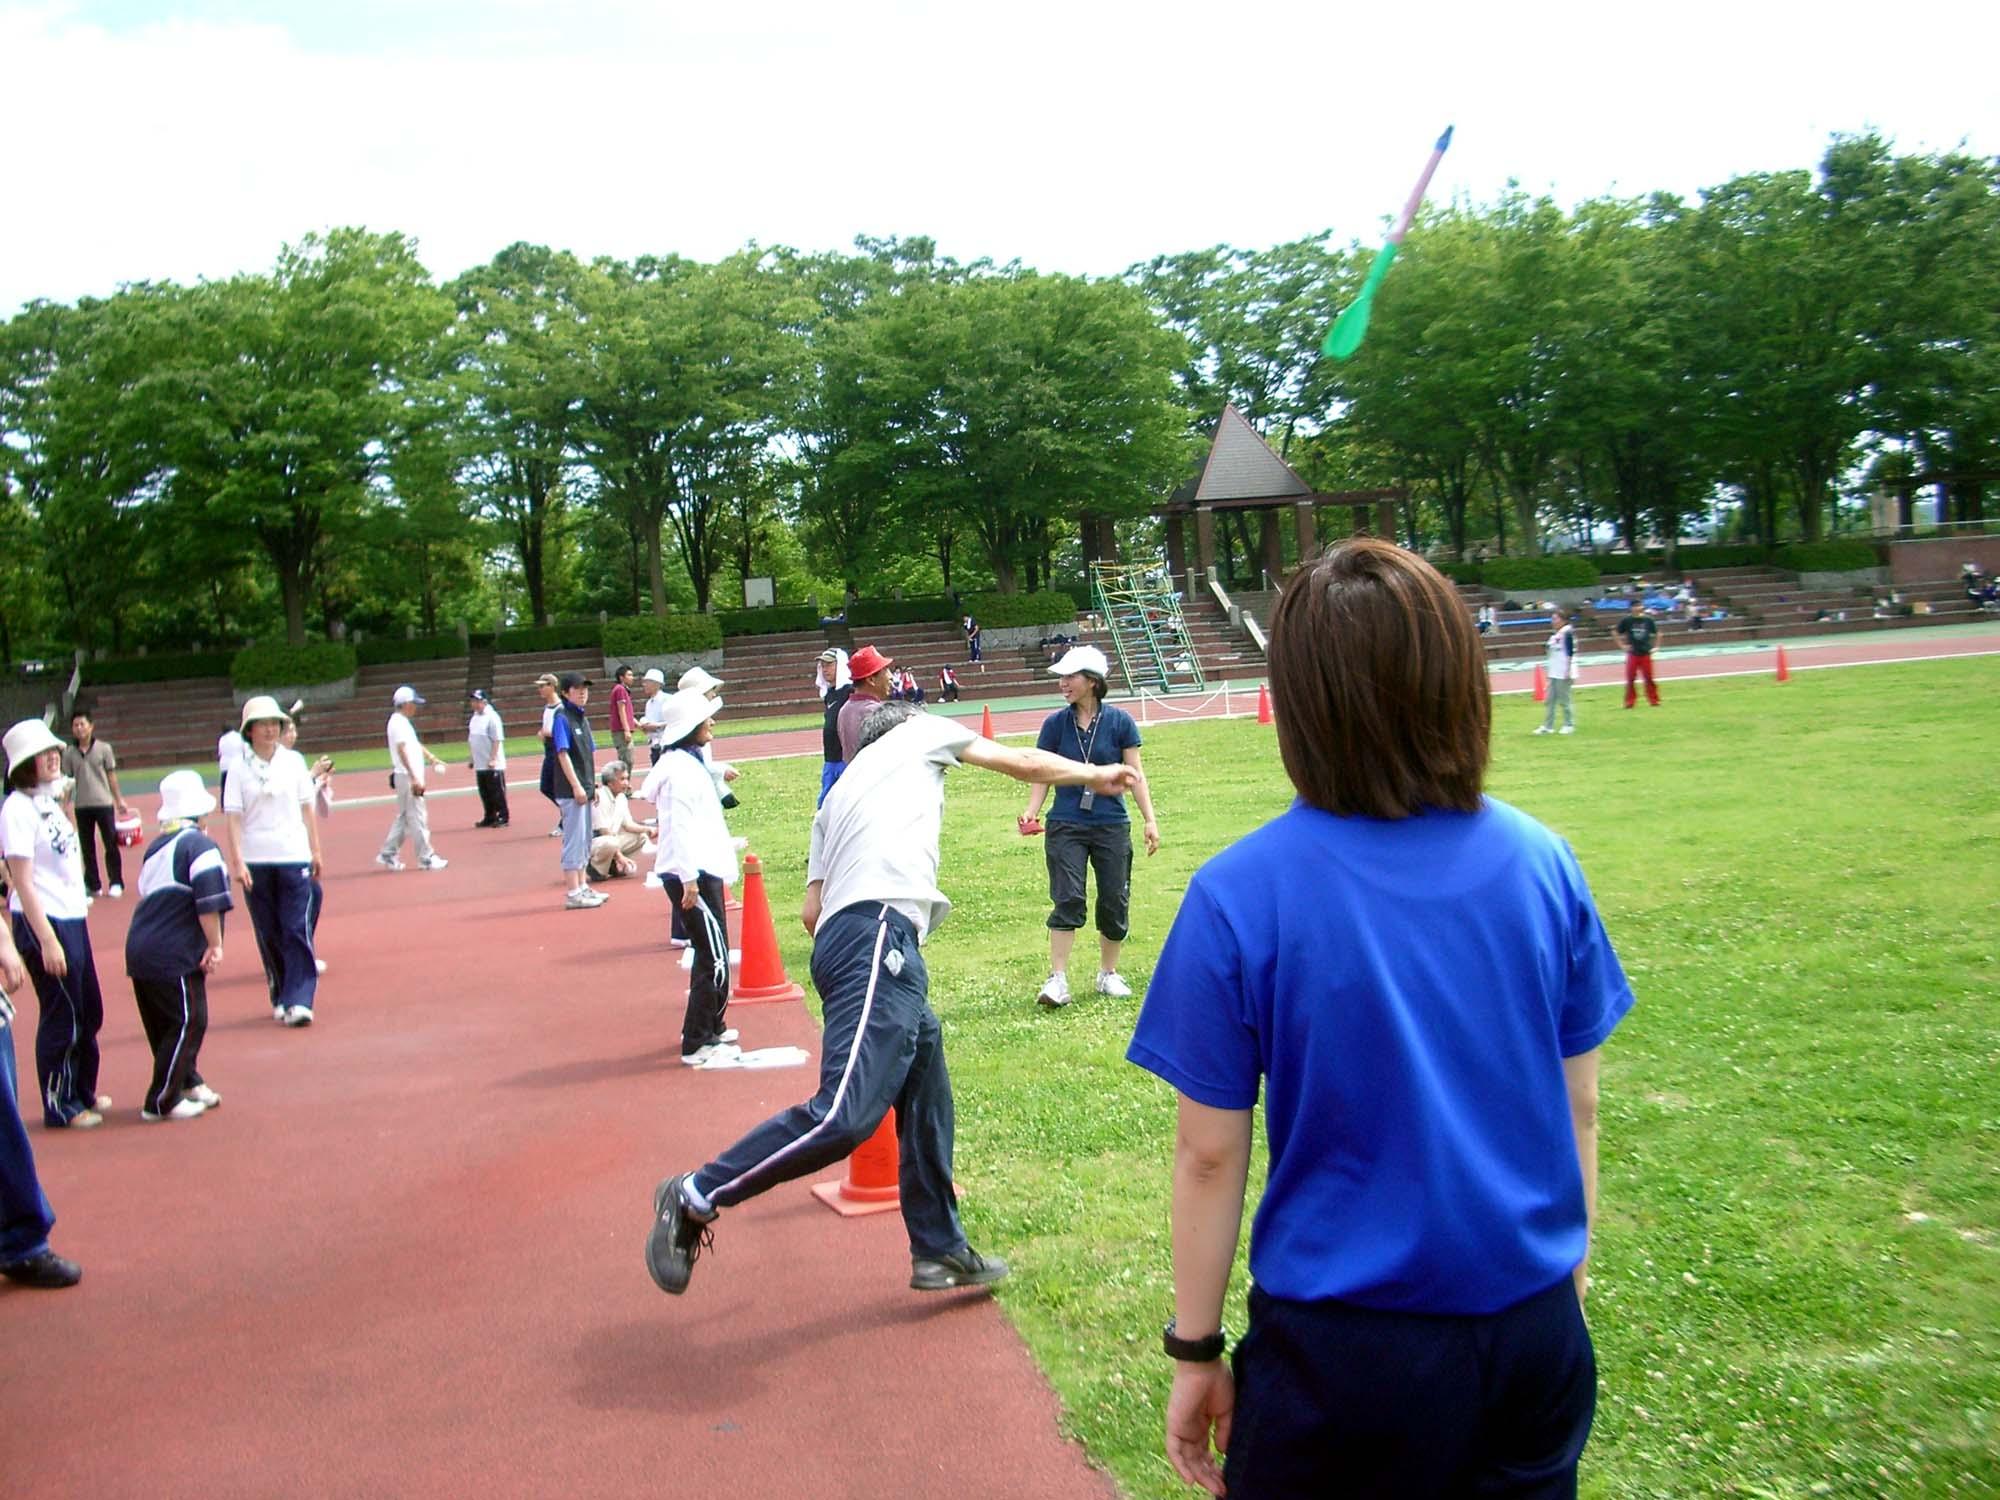 IMGP1900 - 地域支援事業(西多摩地区)より ・・・スポーツ体験を行いました「チャレンジ・ザ・ギネス」。